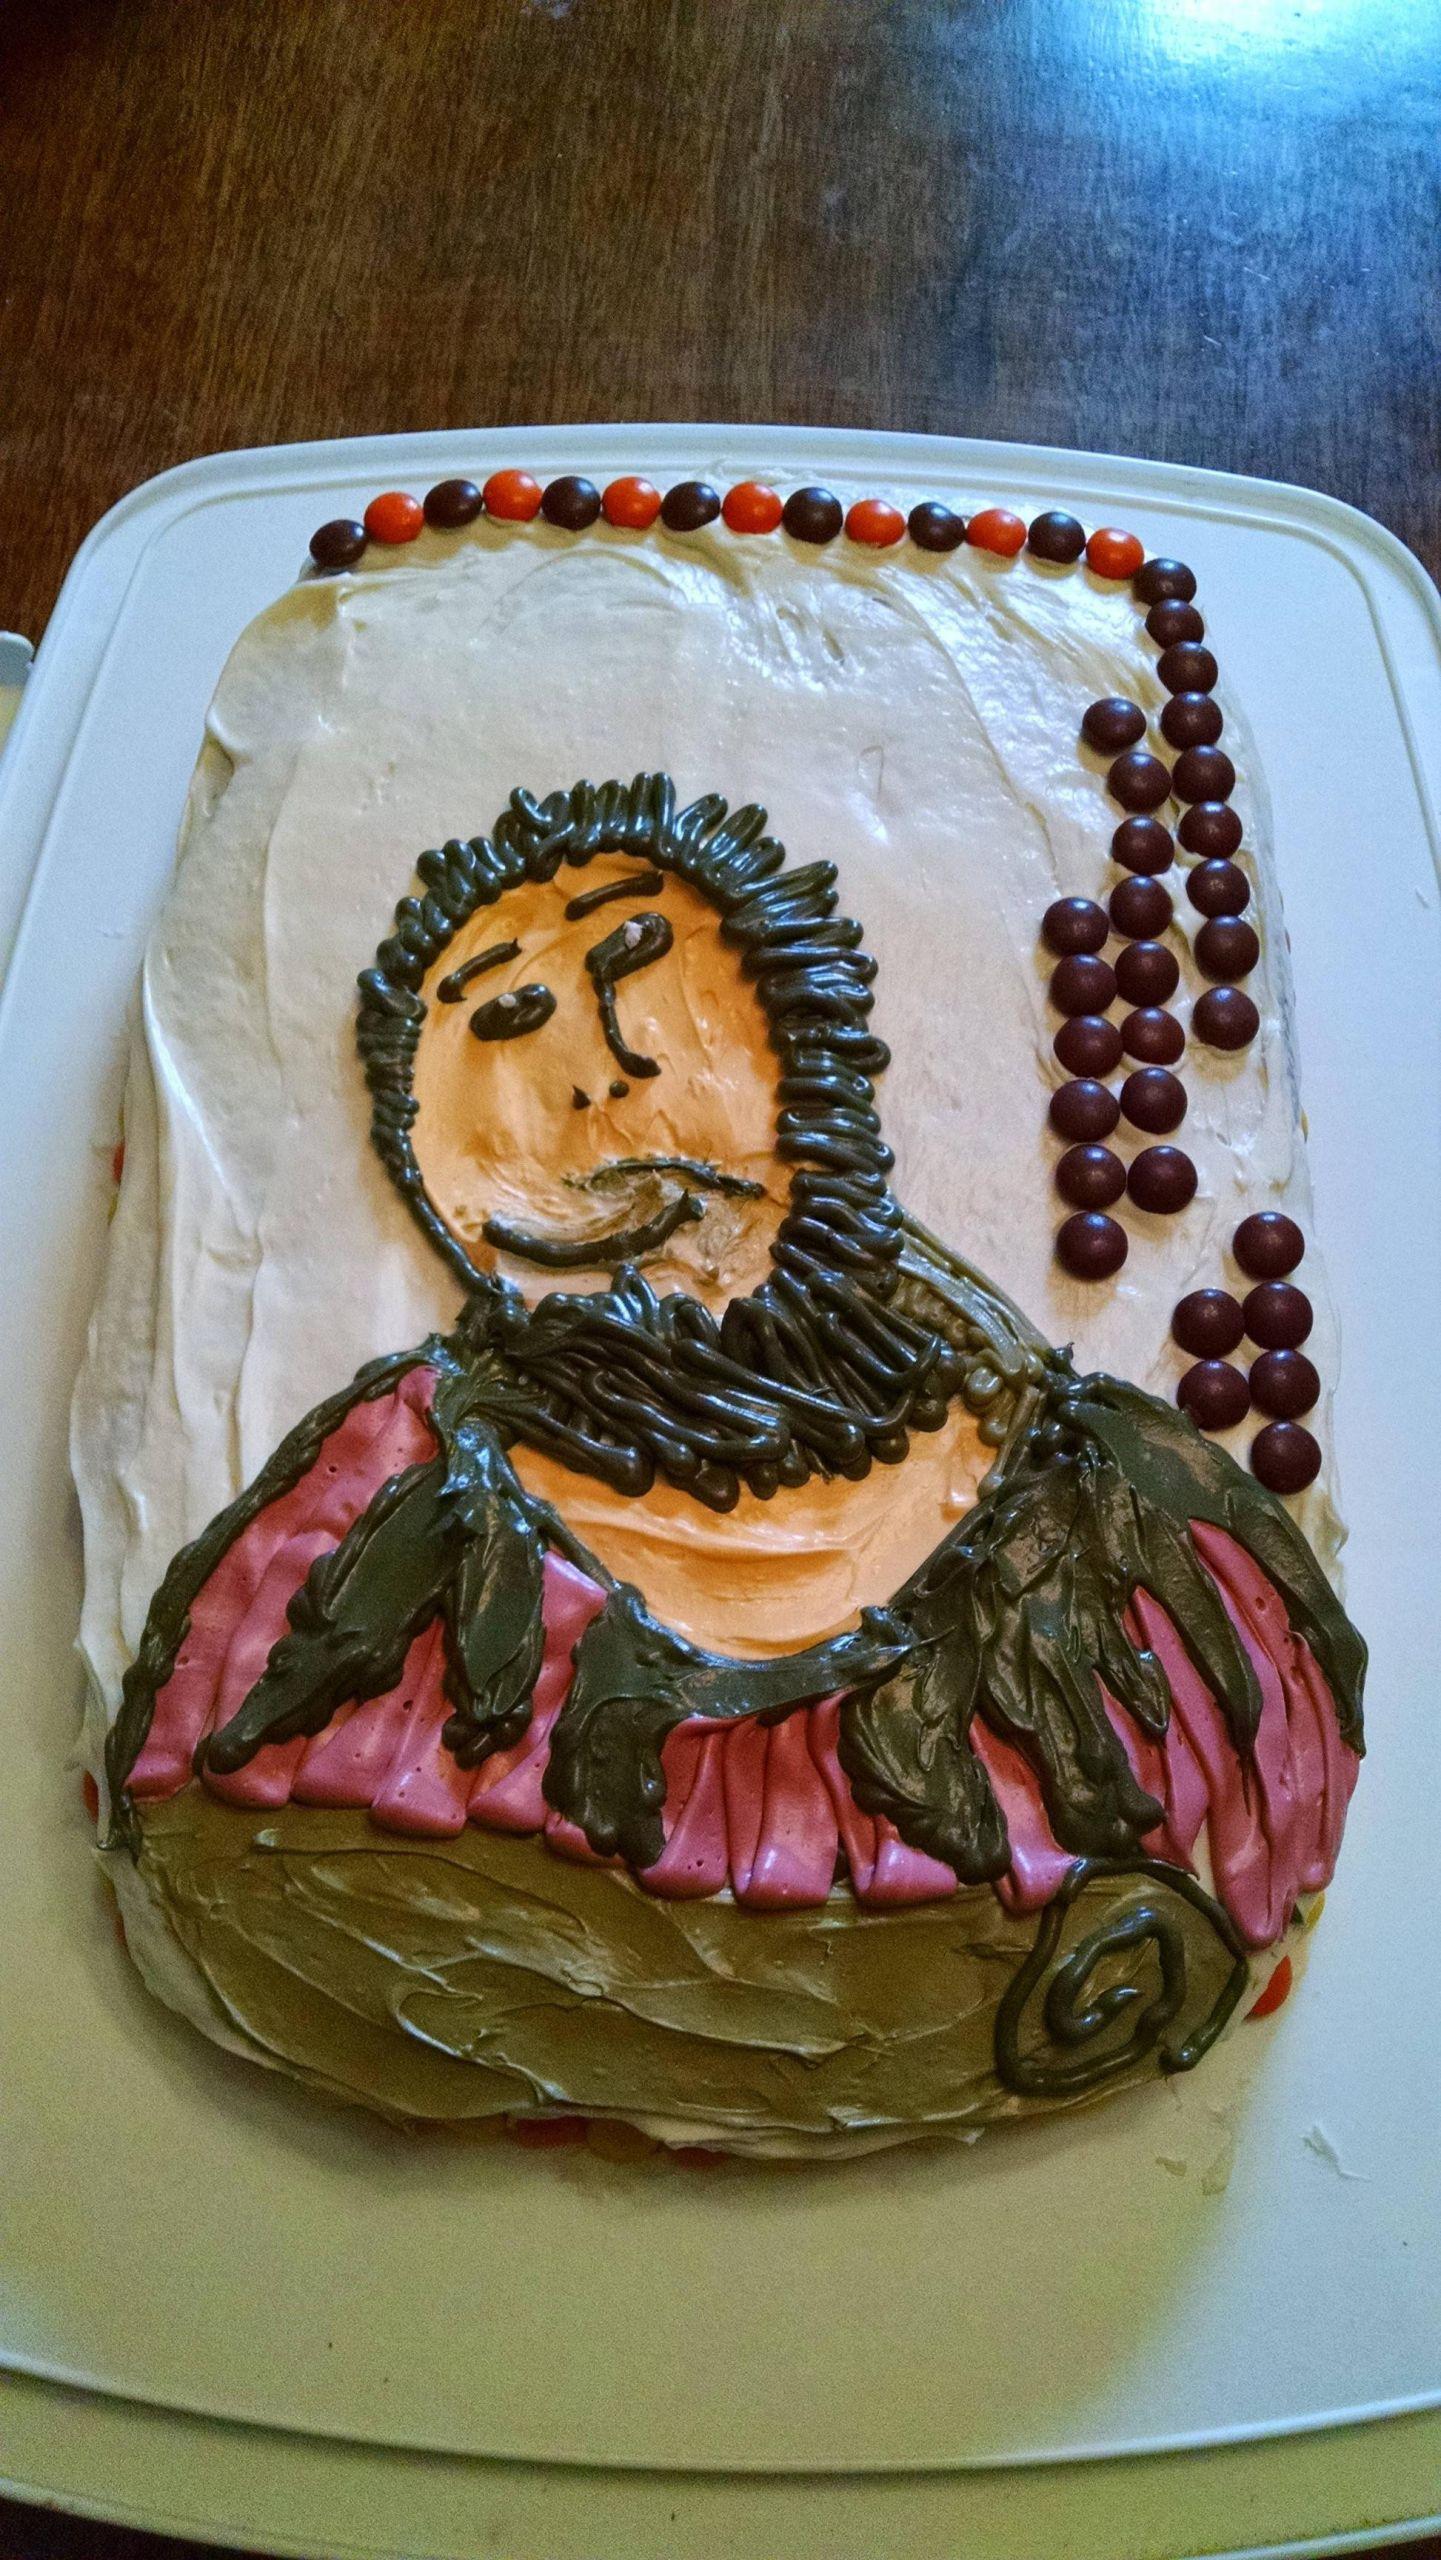 Birthday Cake For Jesus  My boyfriend said he wanted a Reese s Pieces Rhesus Jesus